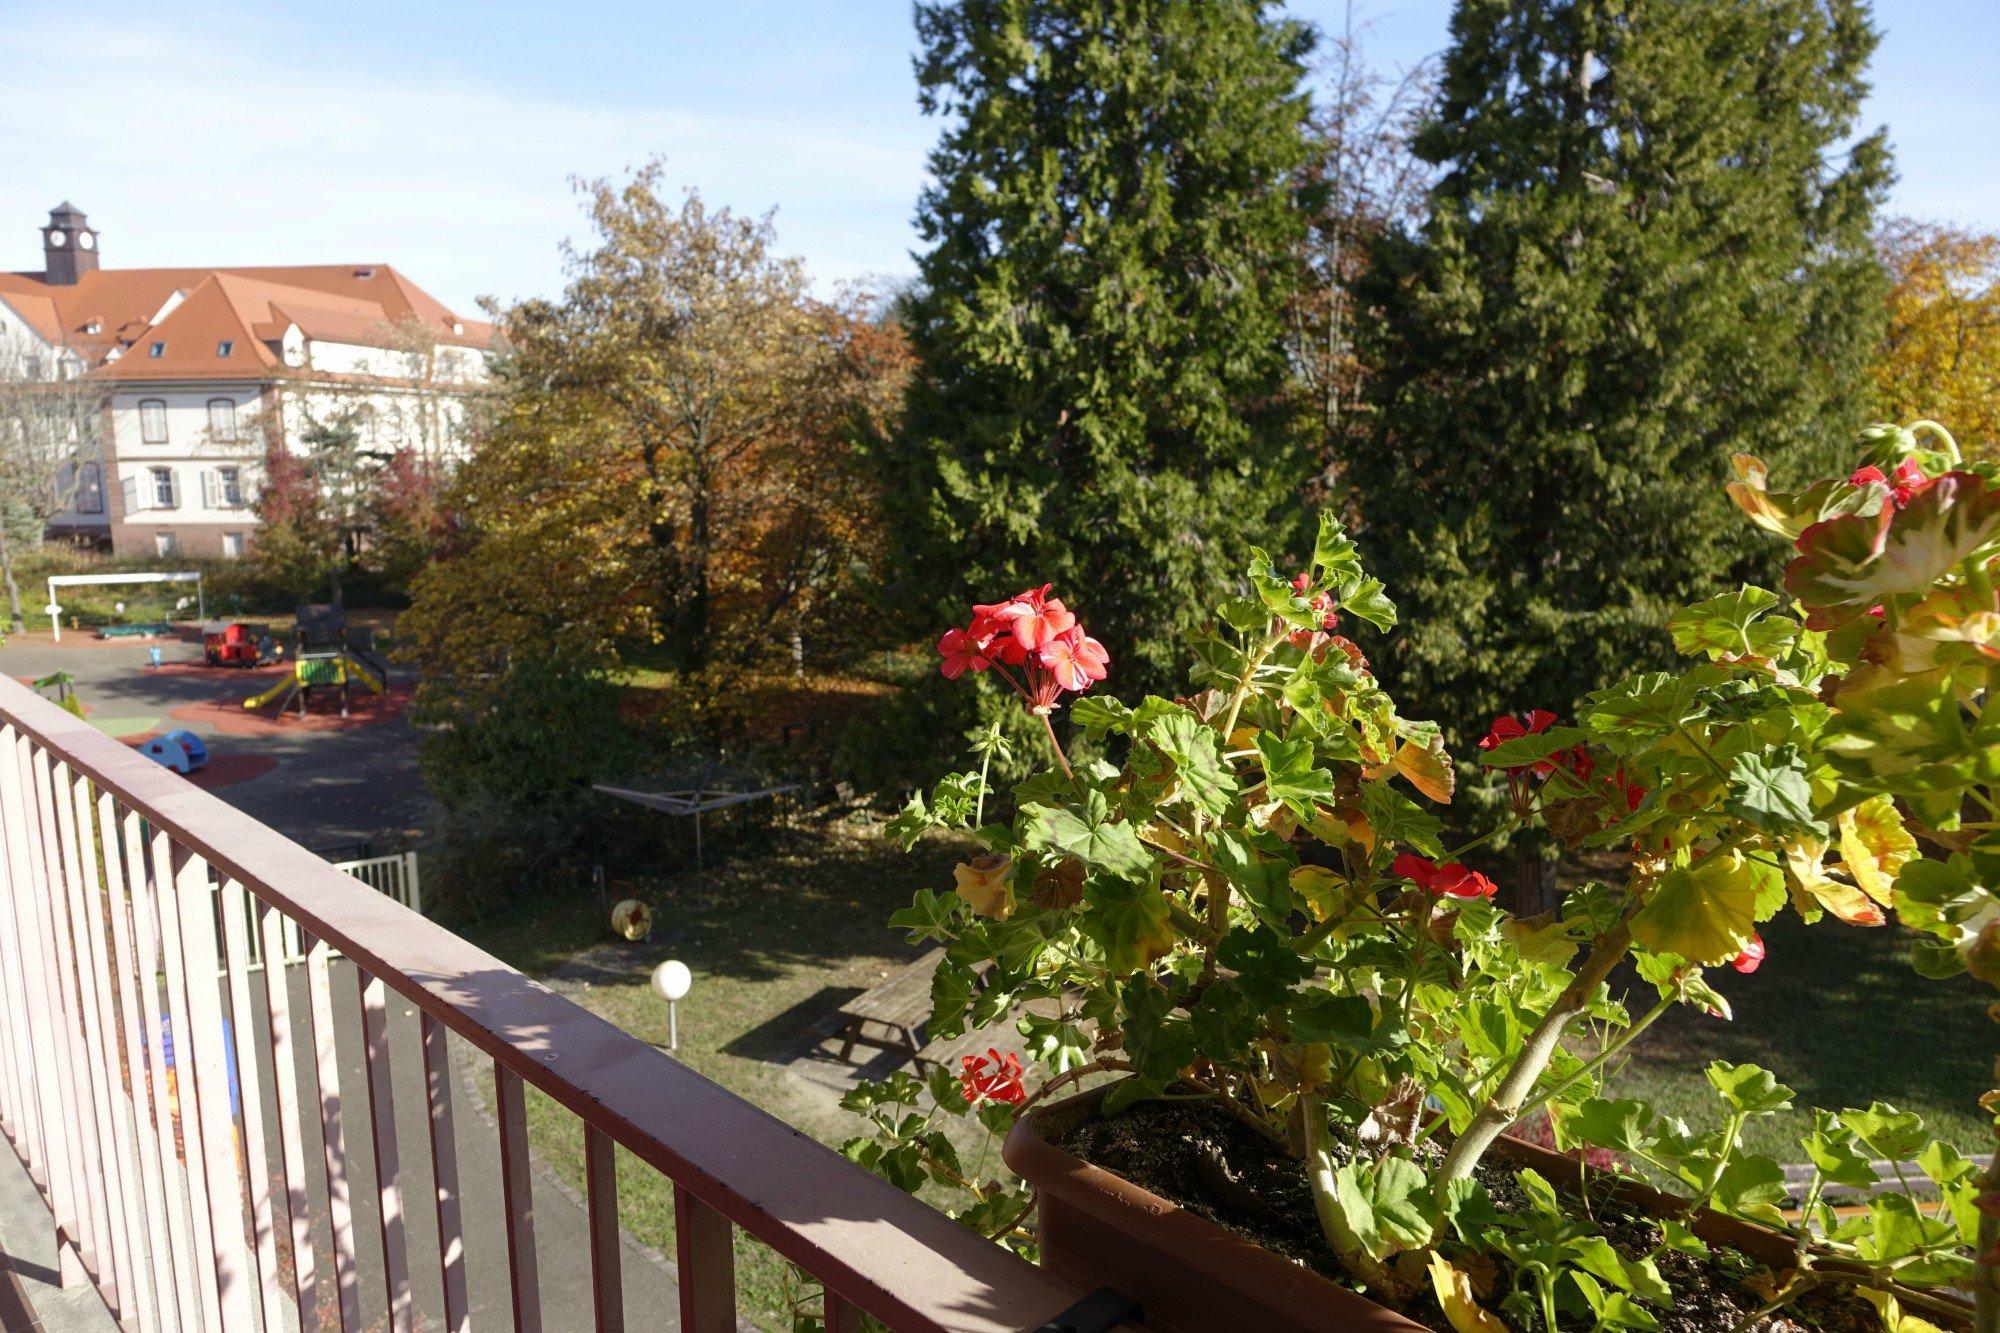 Youth hostel Mittelharth